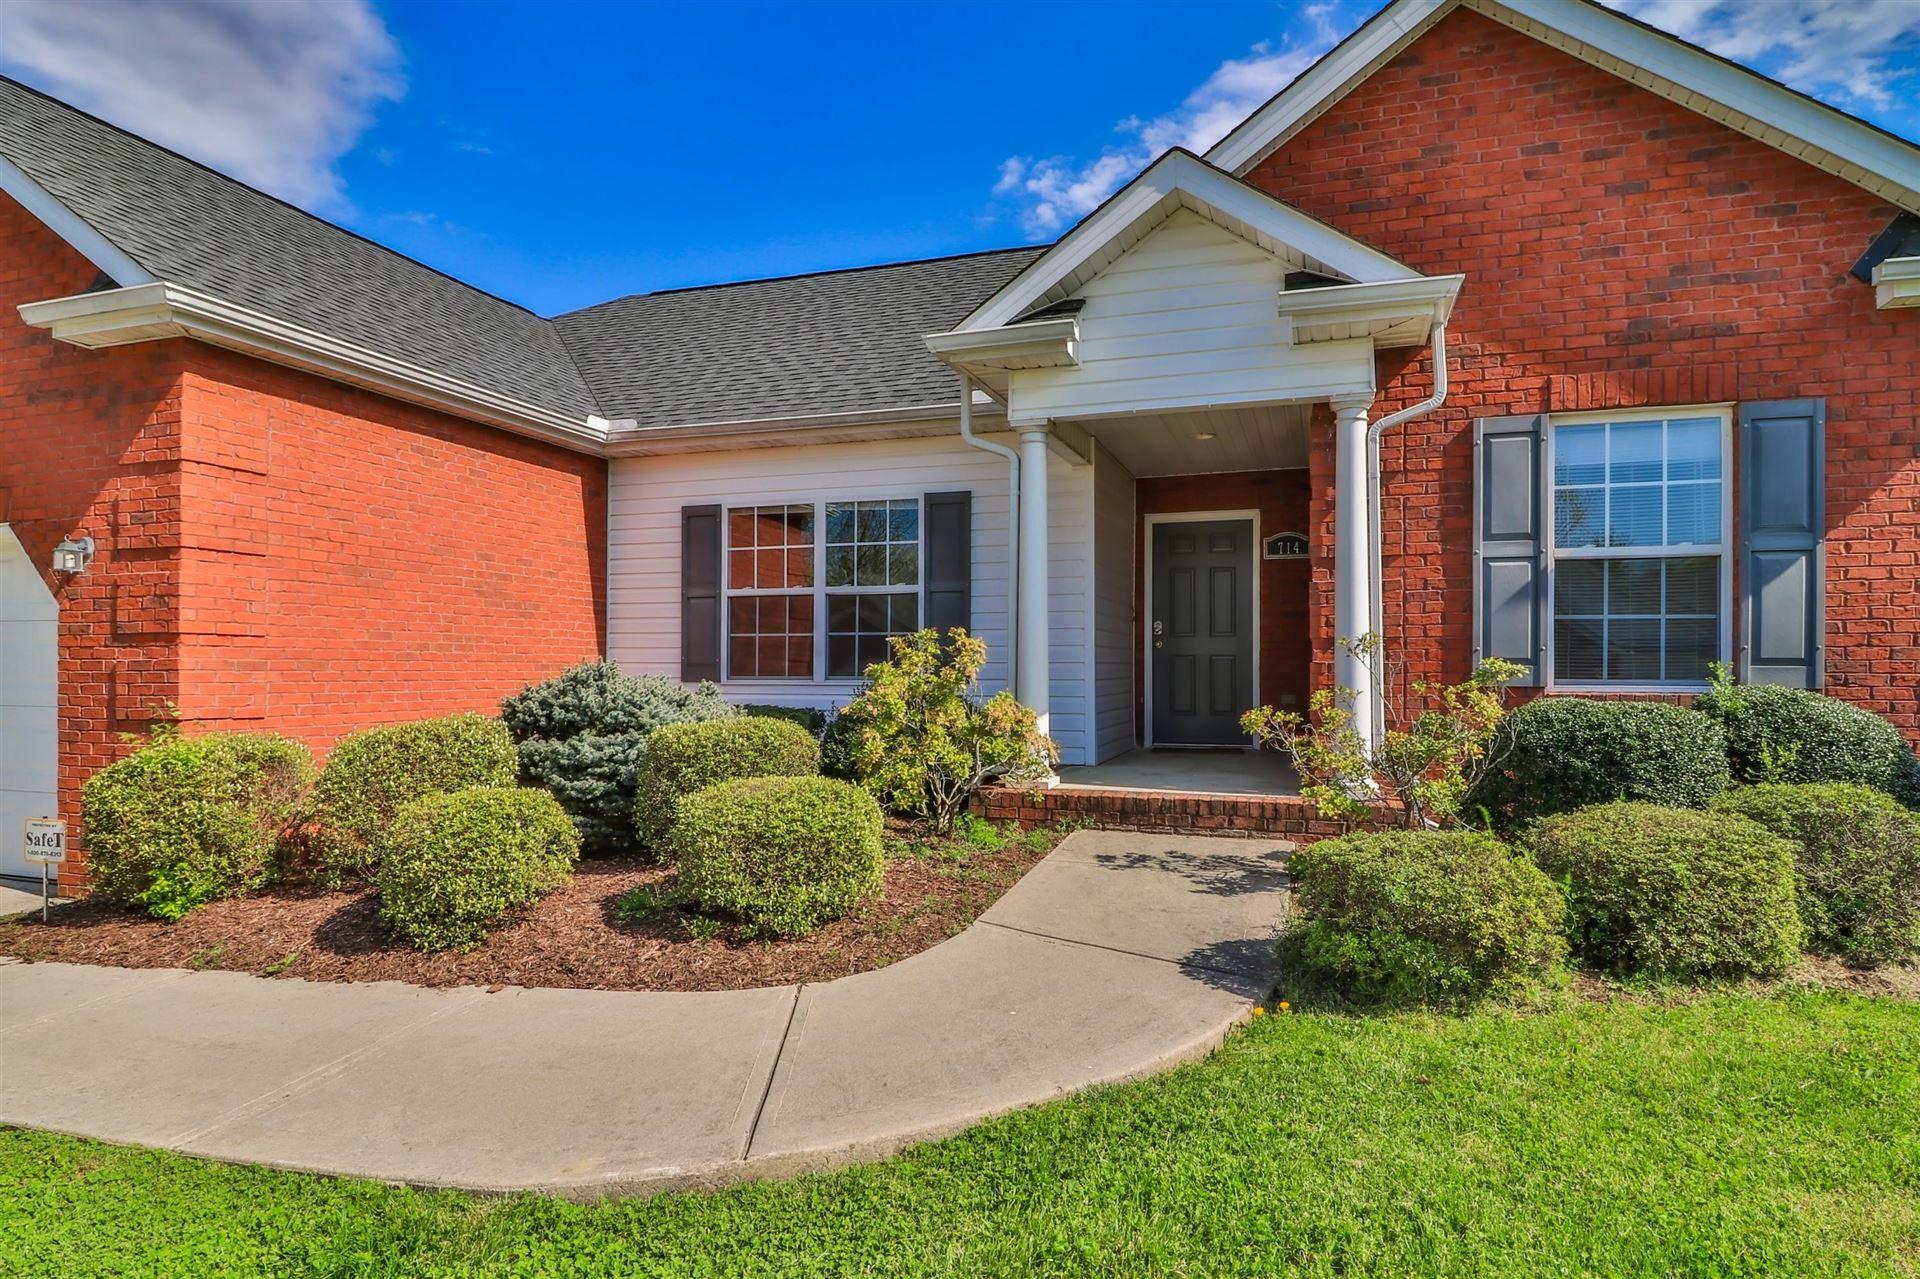 Photo of 714 Chamberlain Manor Way, Knoxville, TN 37920 (MLS # 1149001)